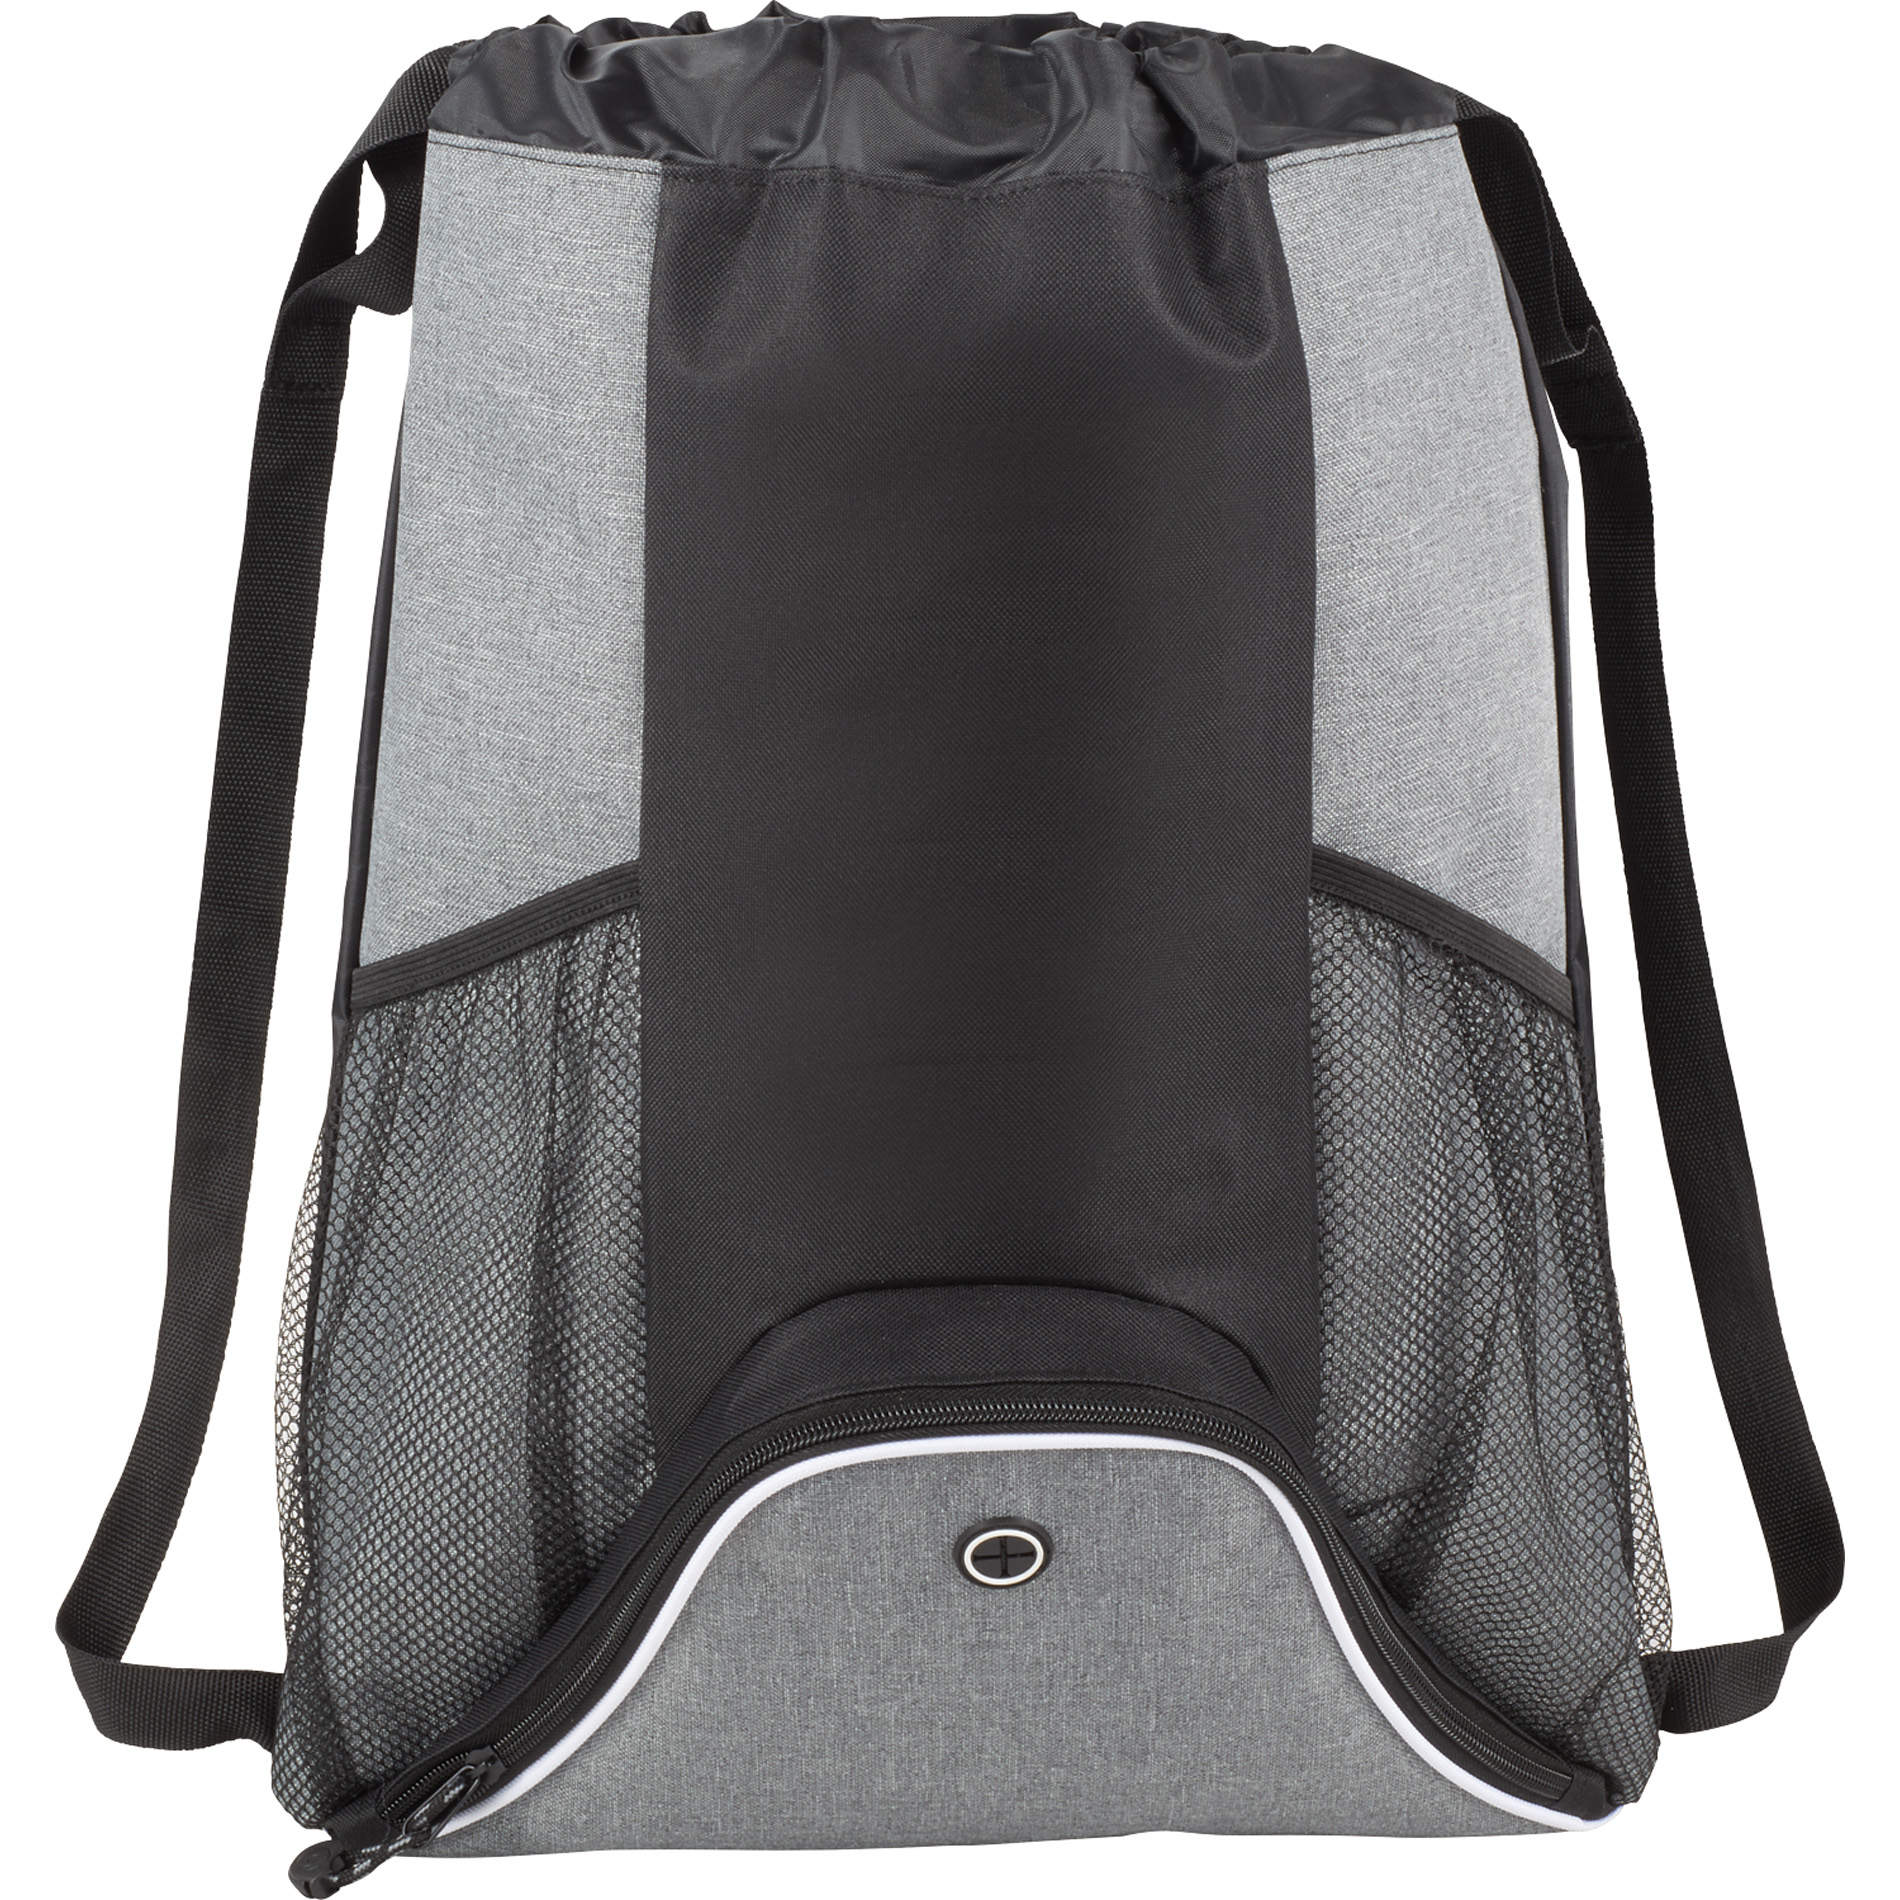 LEEDS 2075-02 - Corona Deluxe Drawstring Sportspack